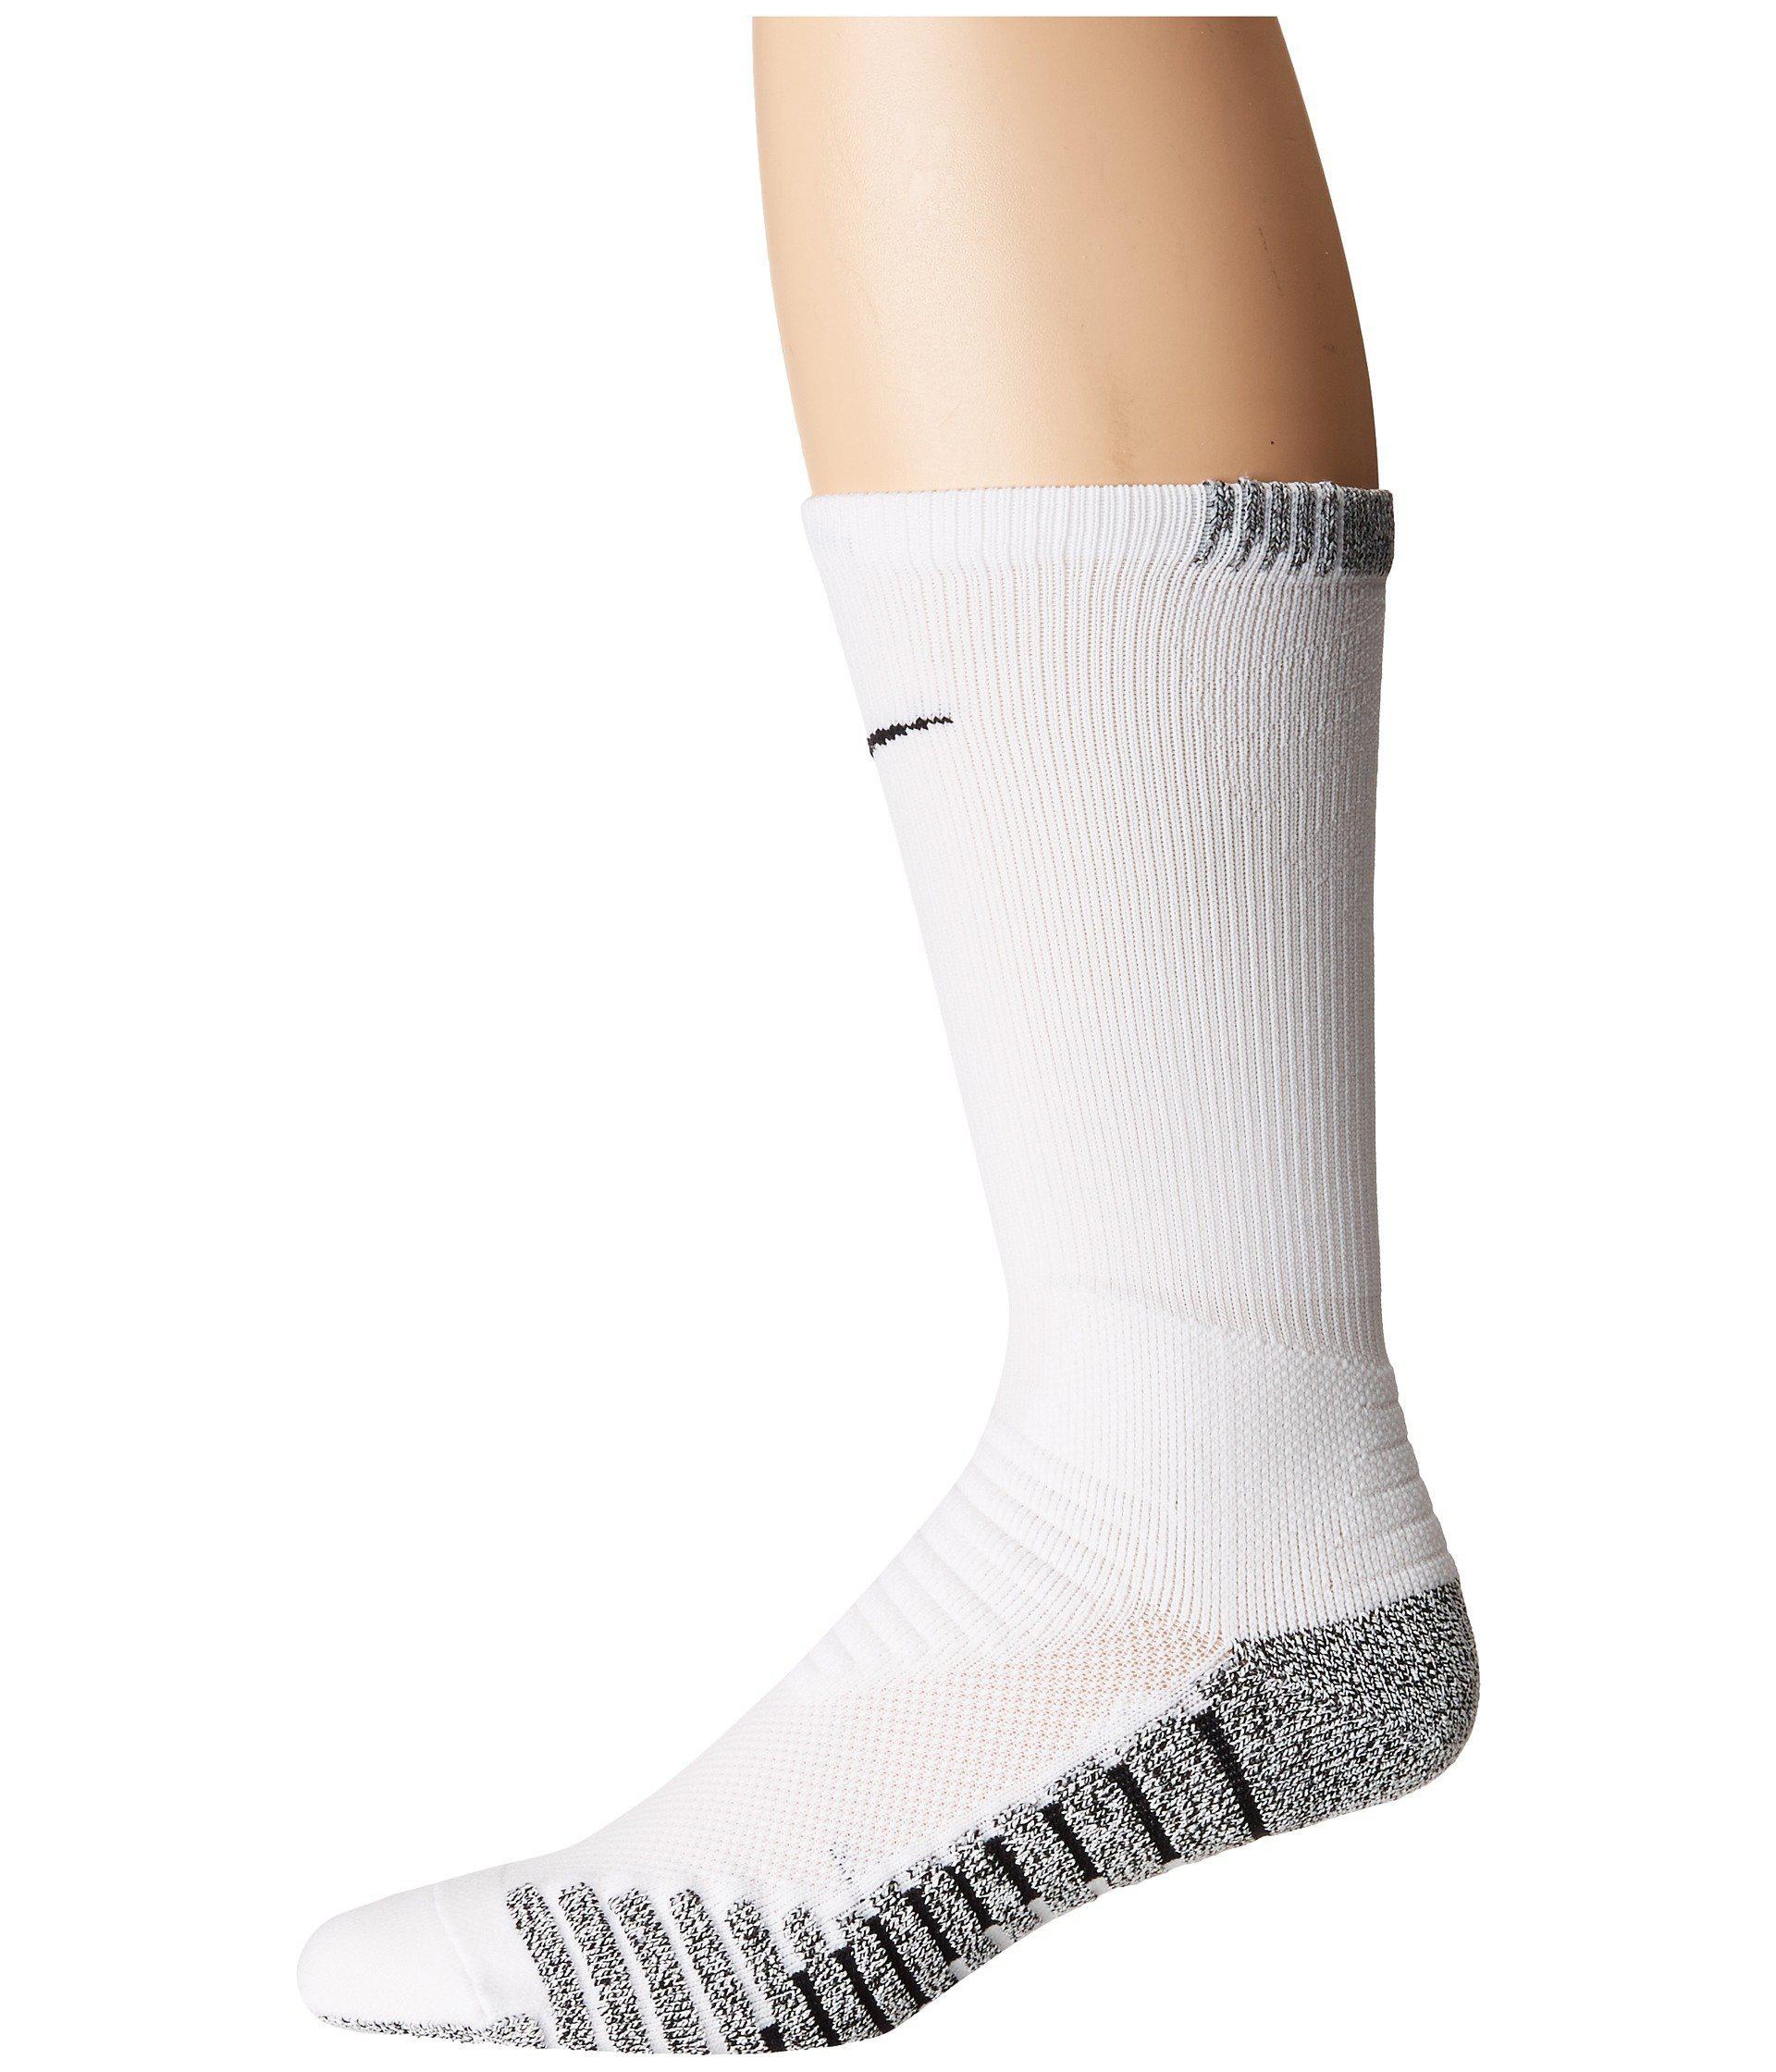 d189f802c0b38 Grip Vapor Crew Football Socks (white/black/black 1) Men's Crew Cut Socks  Shoes